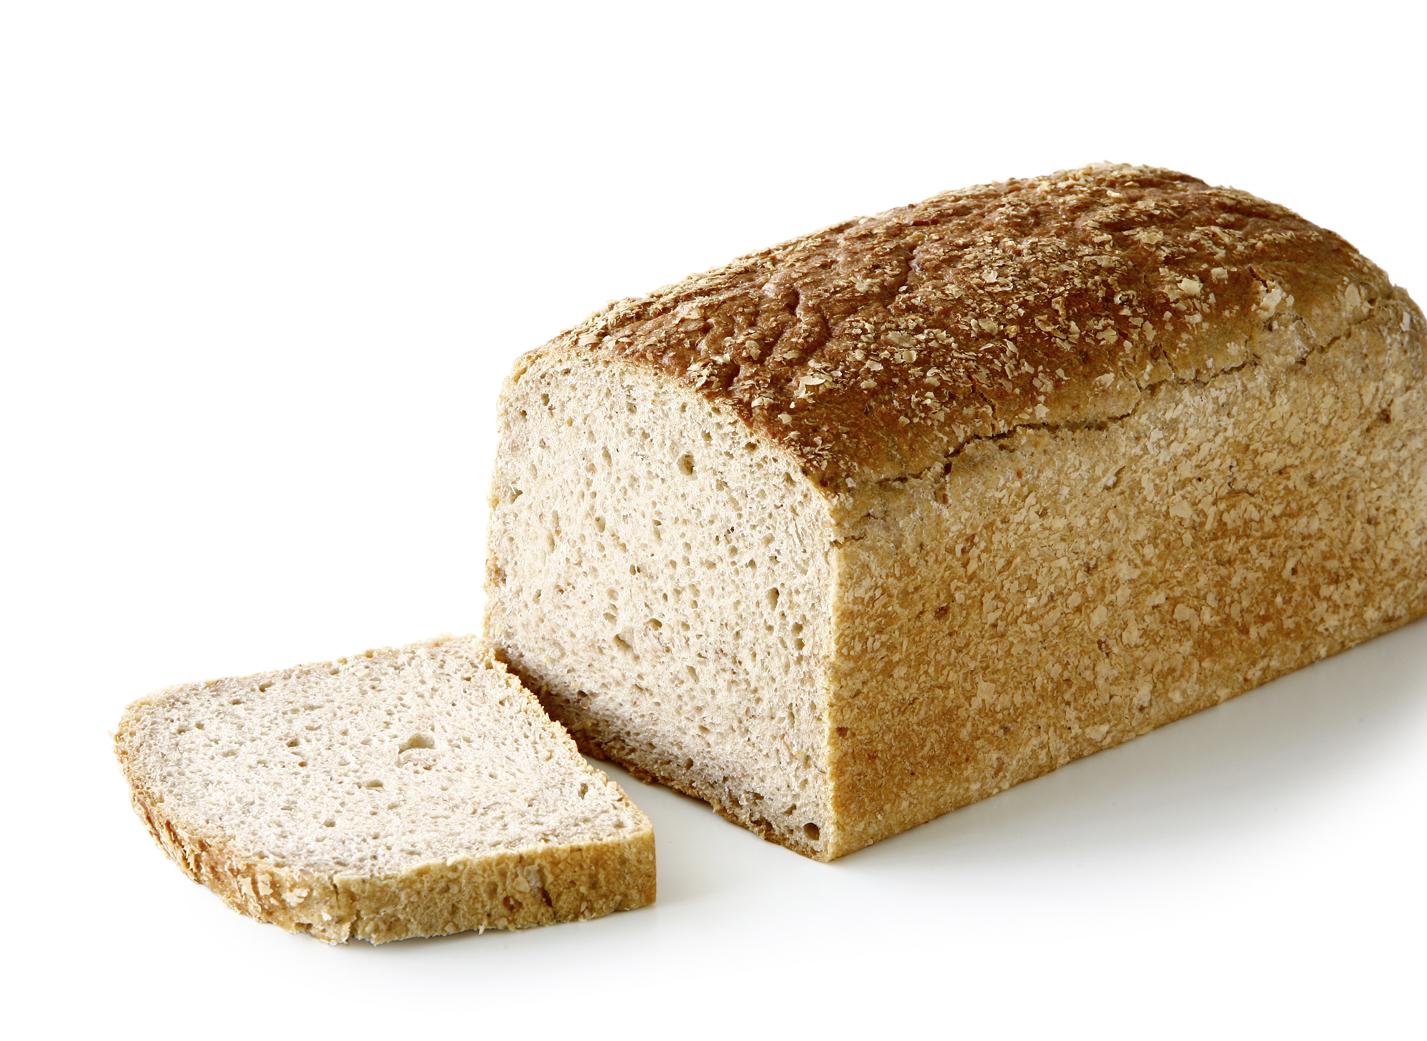 Potato Bread - Wheat mixed bread with 31% wheat flour and 7.5% potato flakes length: 21 cm